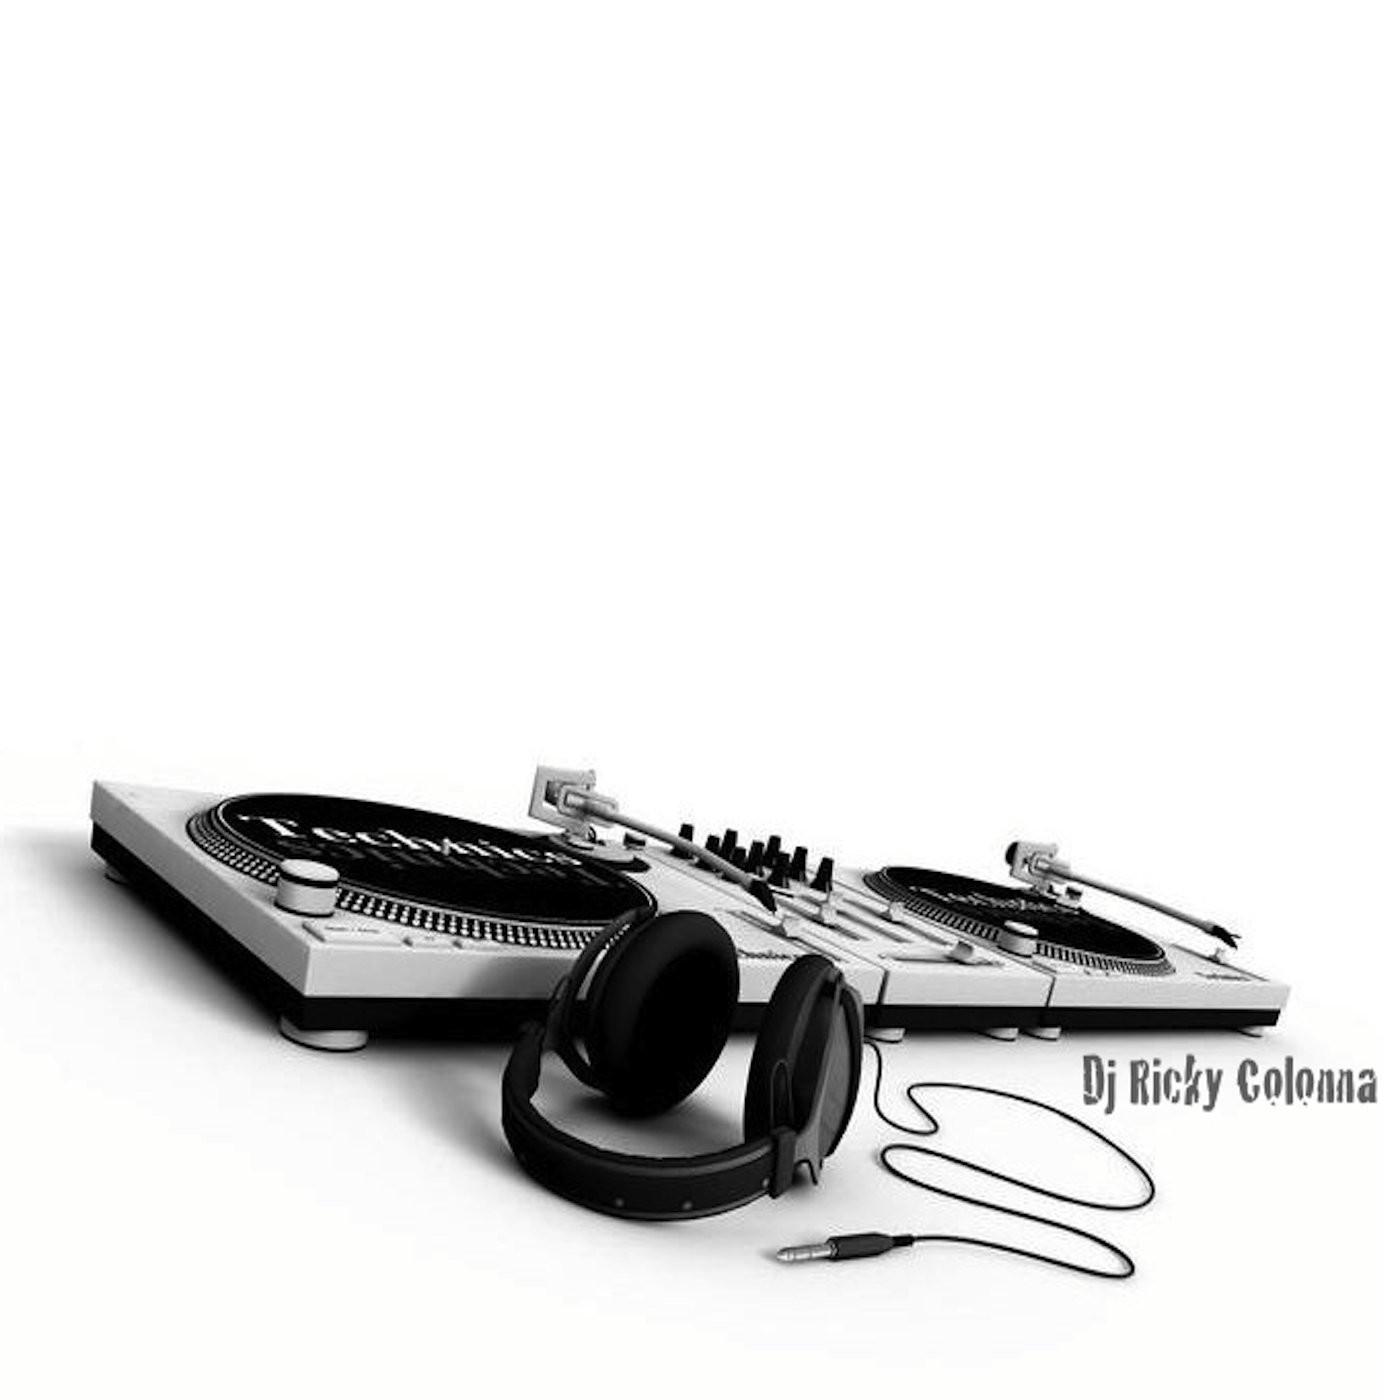 <![CDATA[Dj Ricky Colonna Podcast]]>